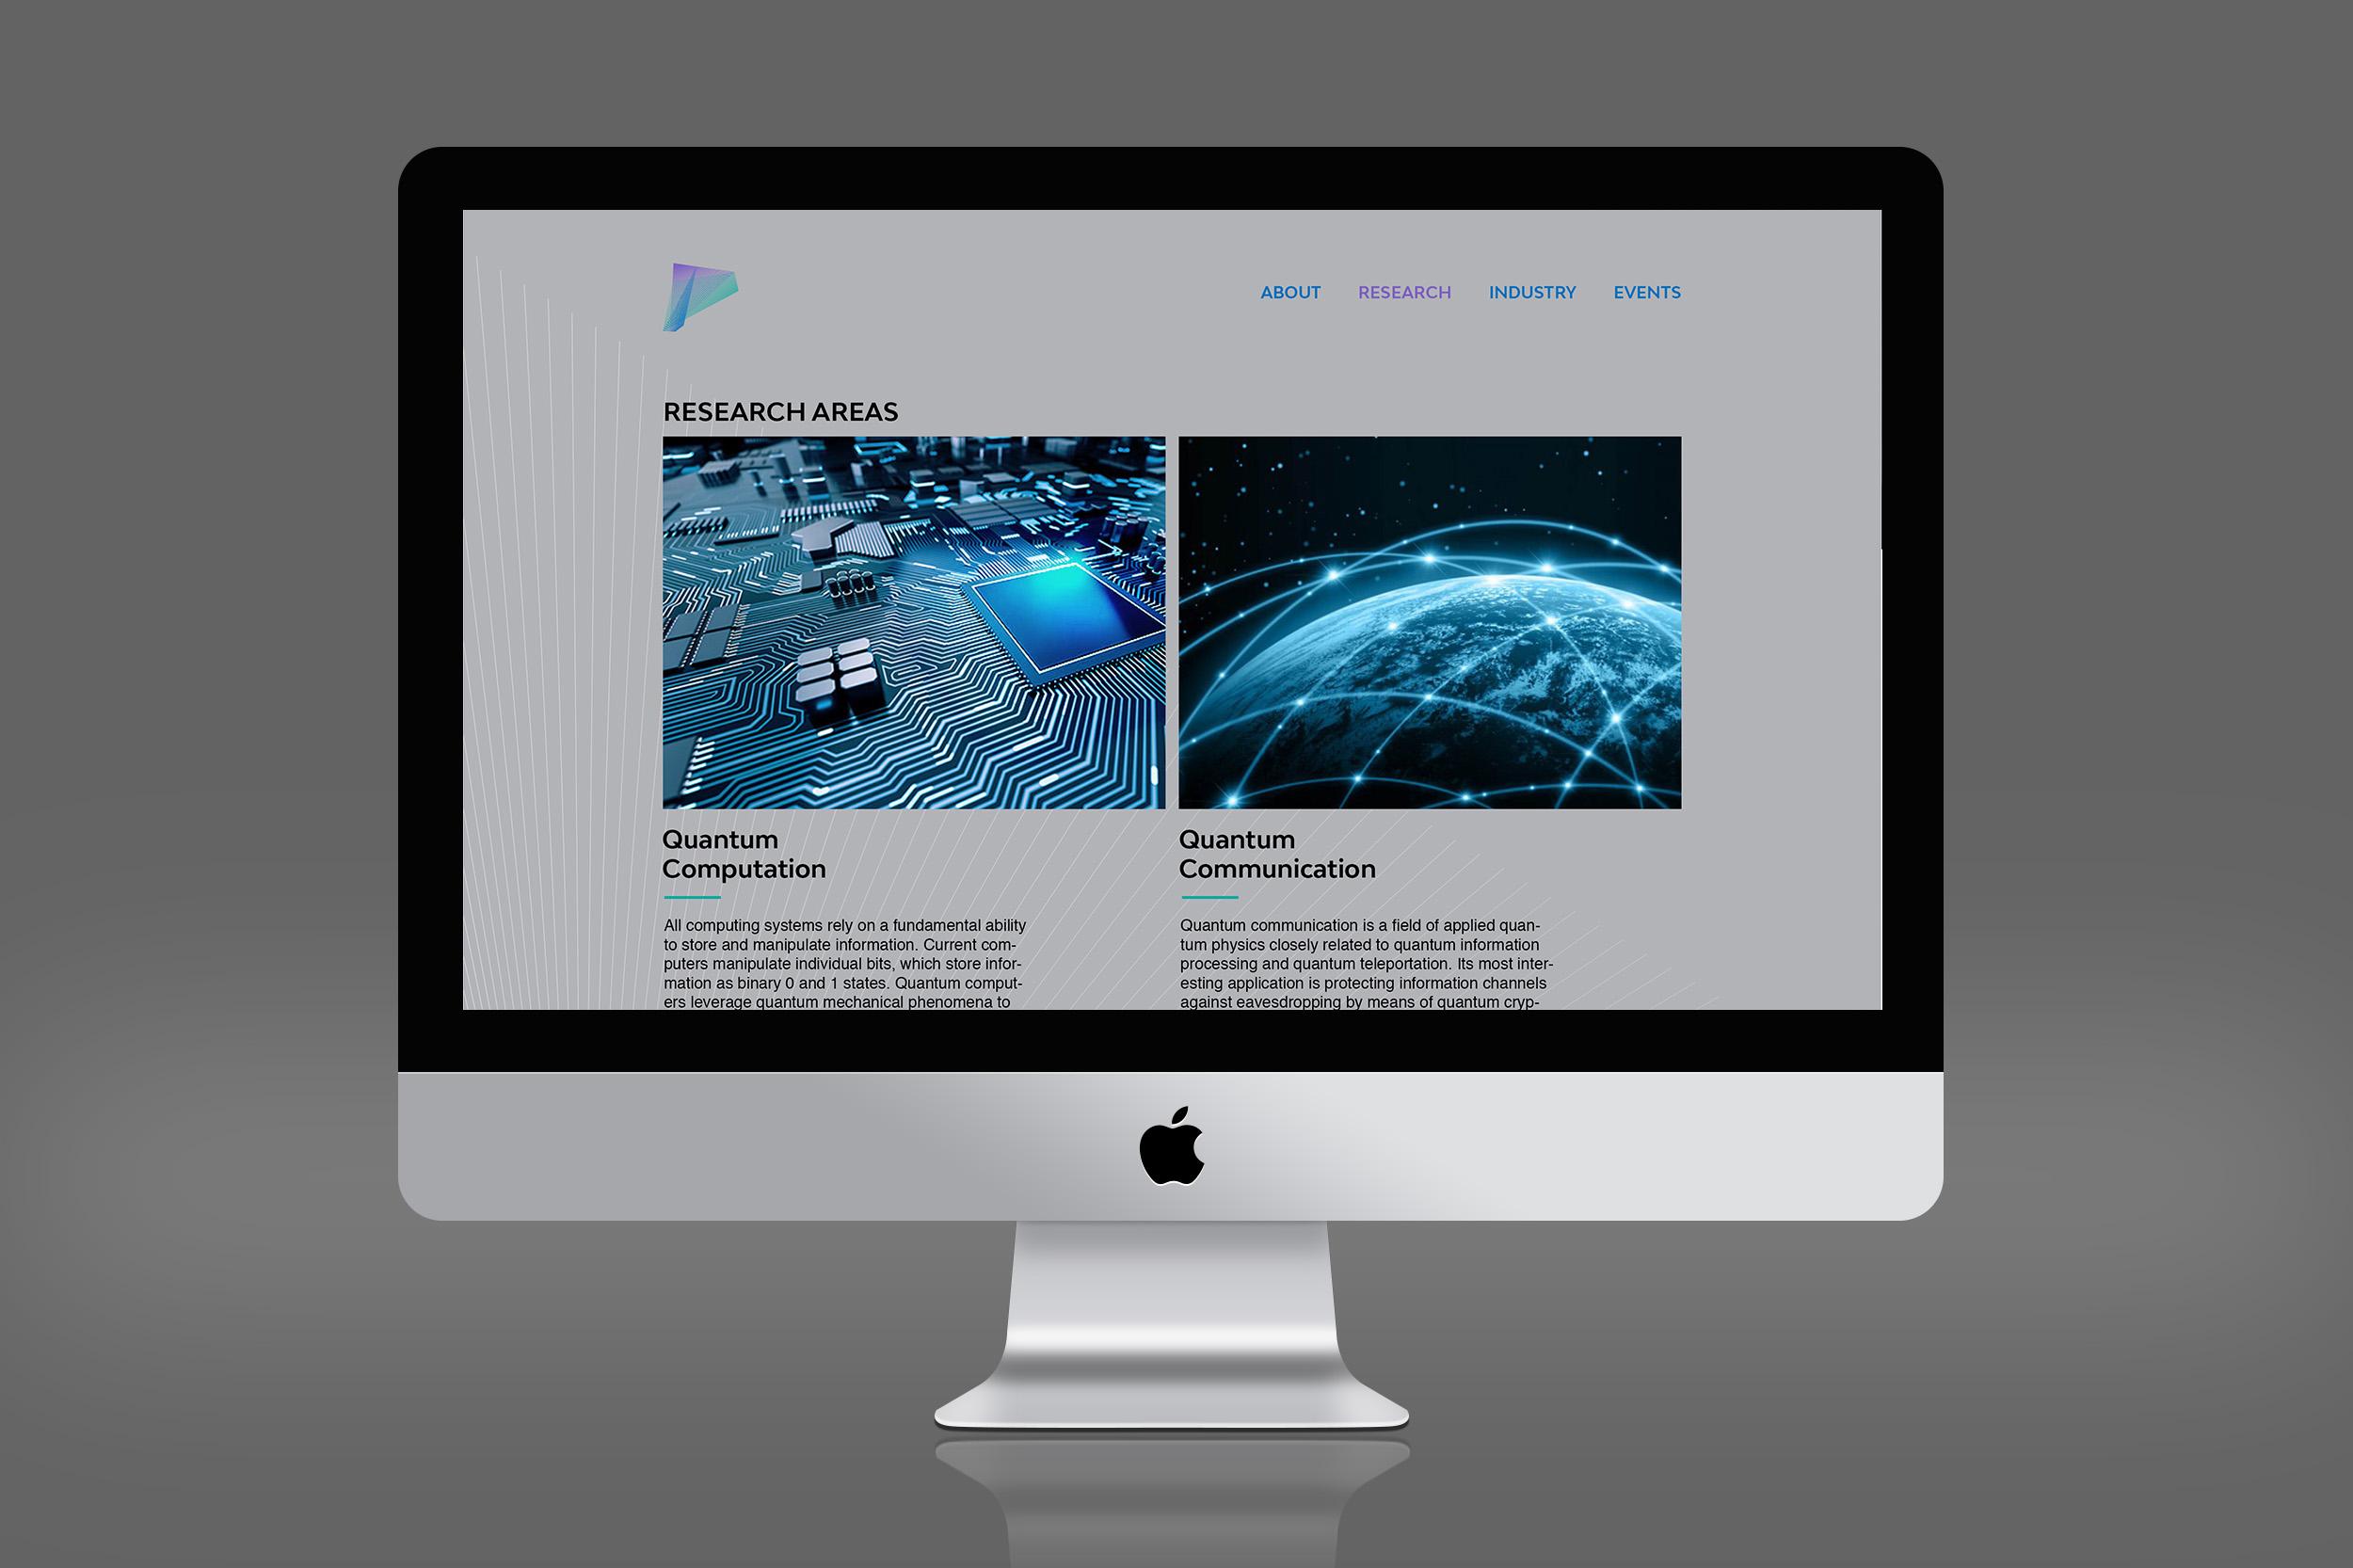 Bitflow-studio-quantumcat-identity-design-logo-research-network-11